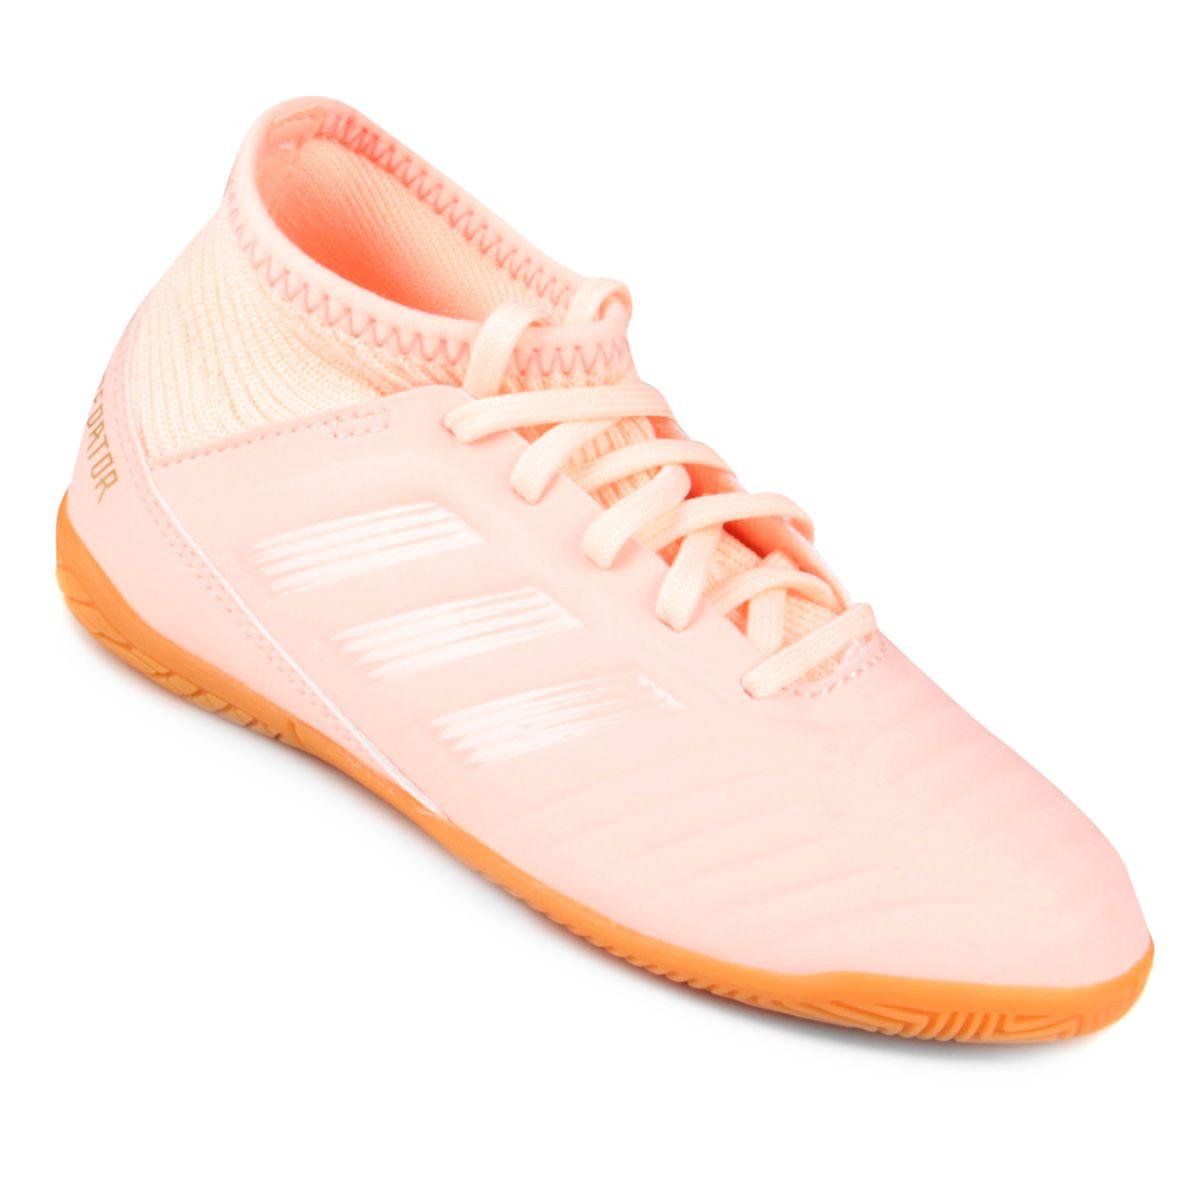 5eae9367e7b2b Chuteira Futsal Infantil Adidas Predator 18 3 IN - Compre Agora | Netshoes  Chuteira Futsal Infantil